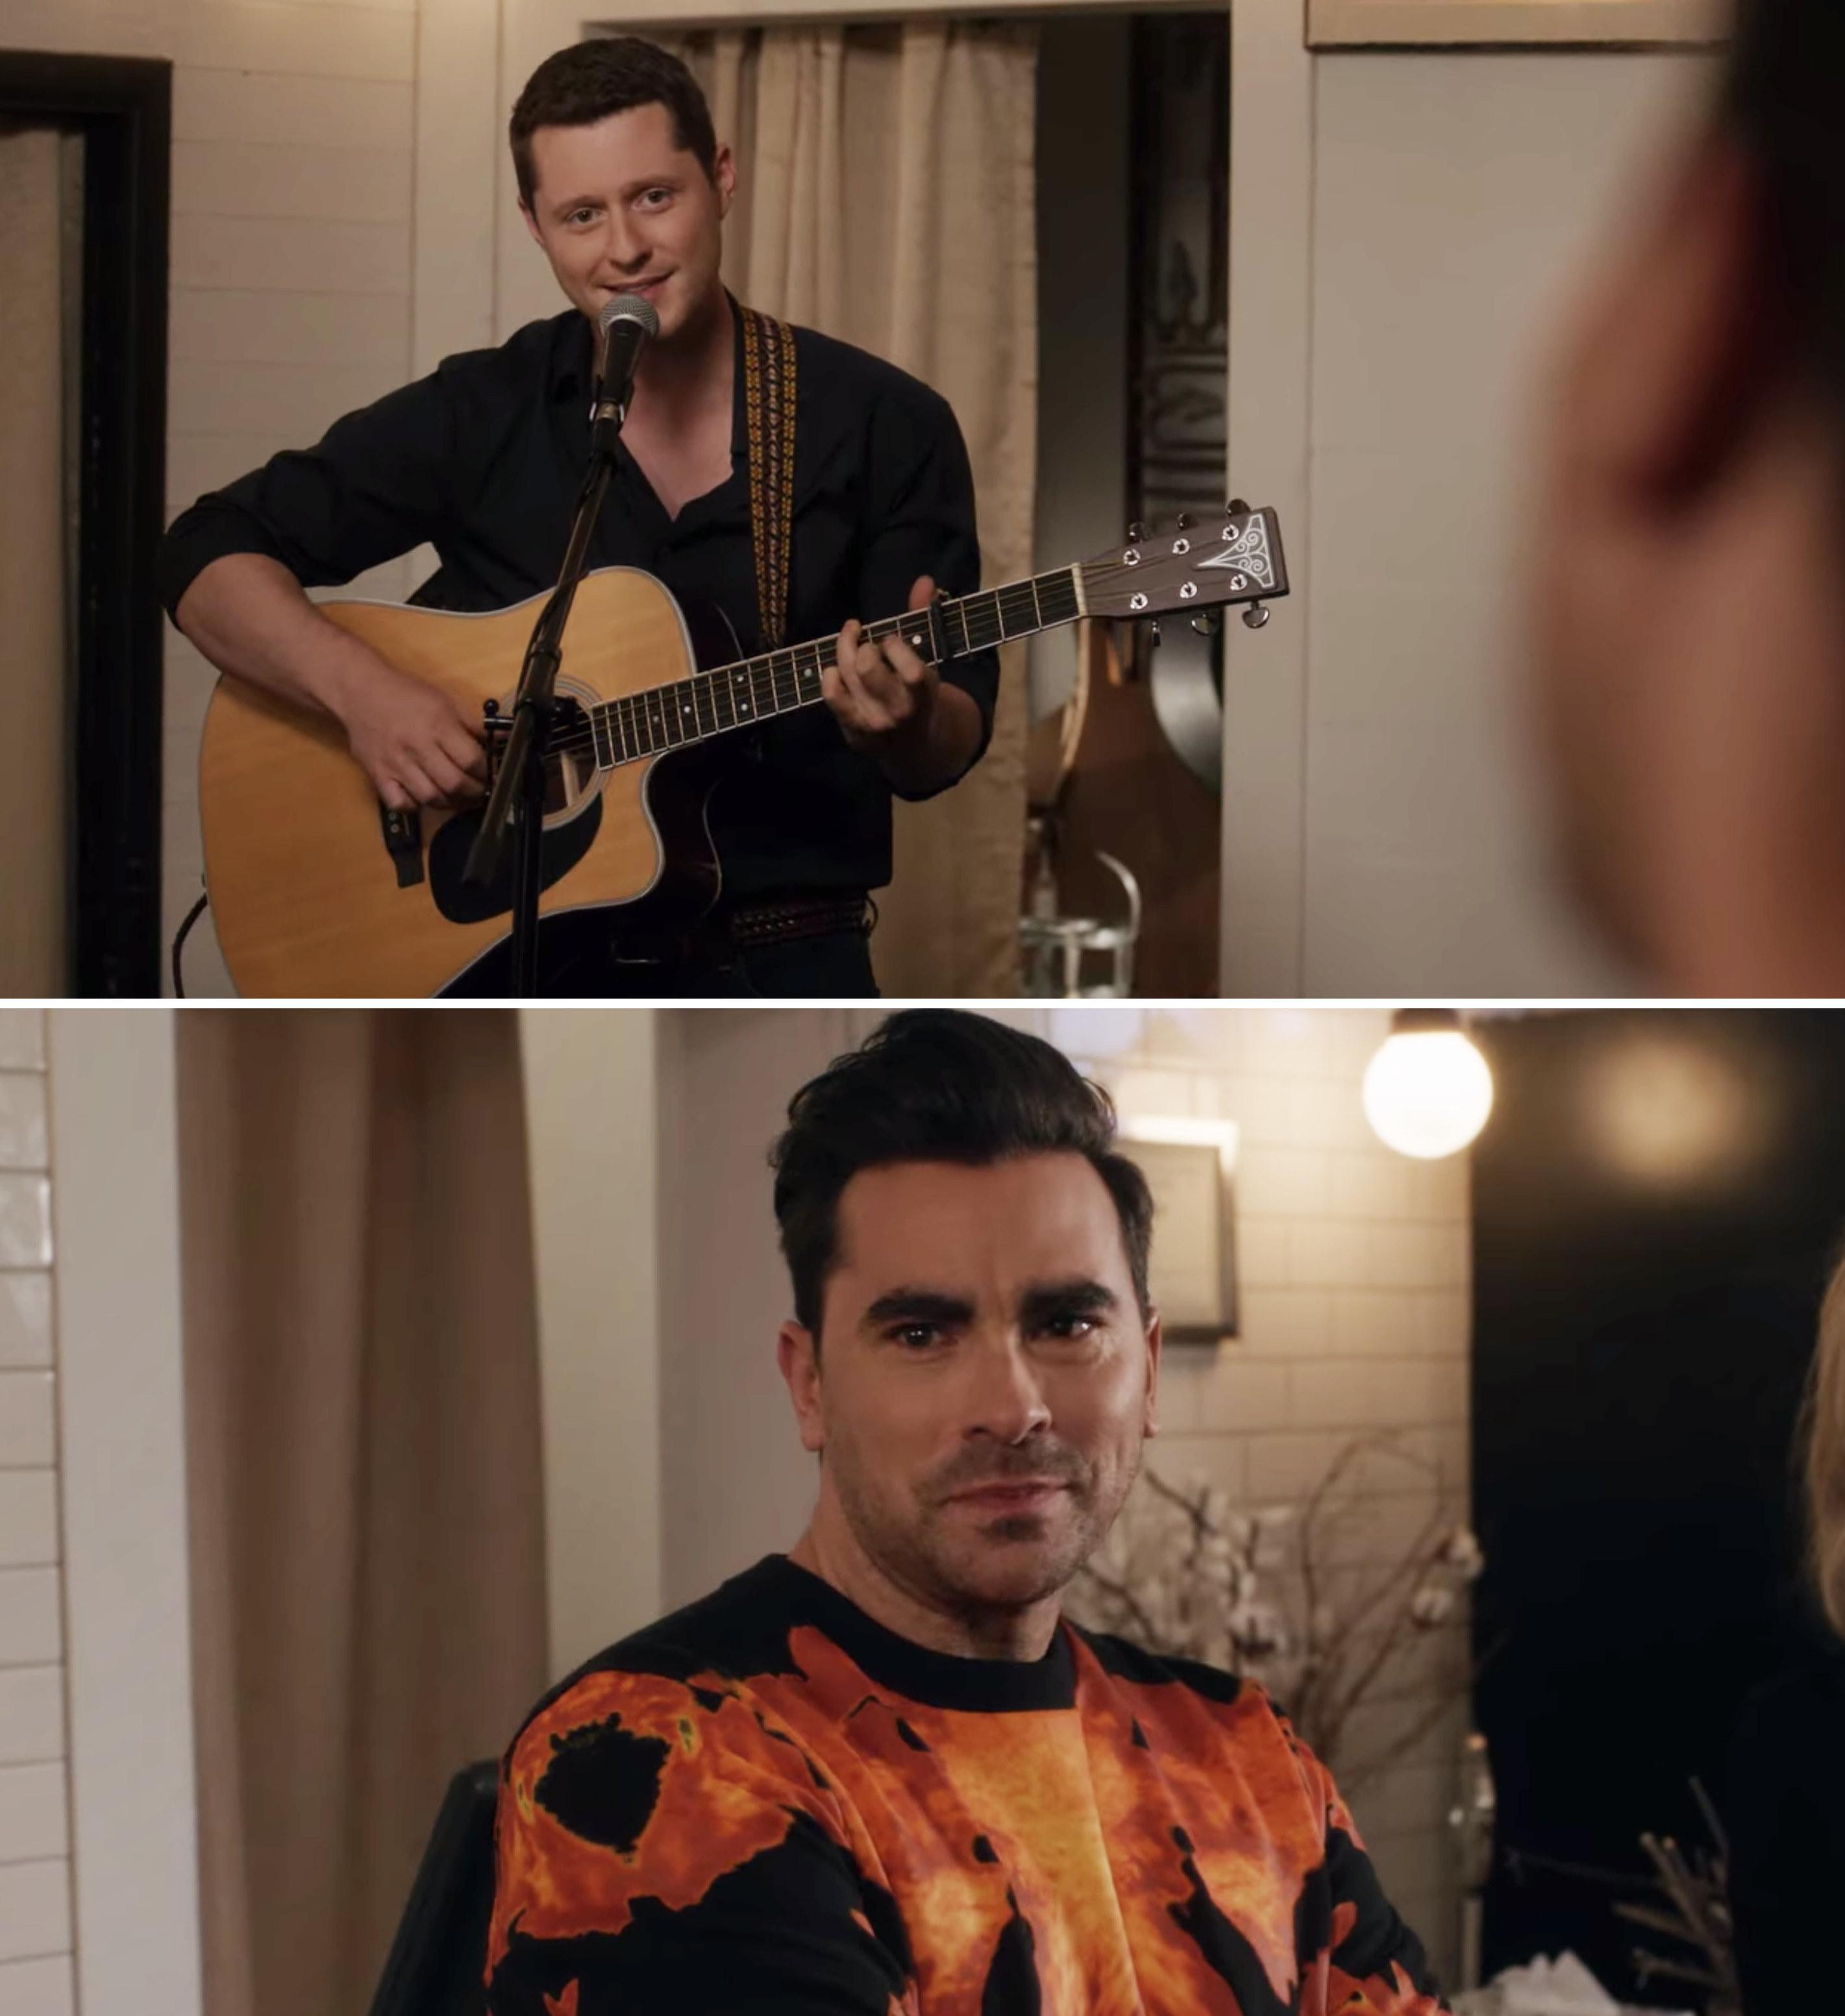 Patrick serenading David